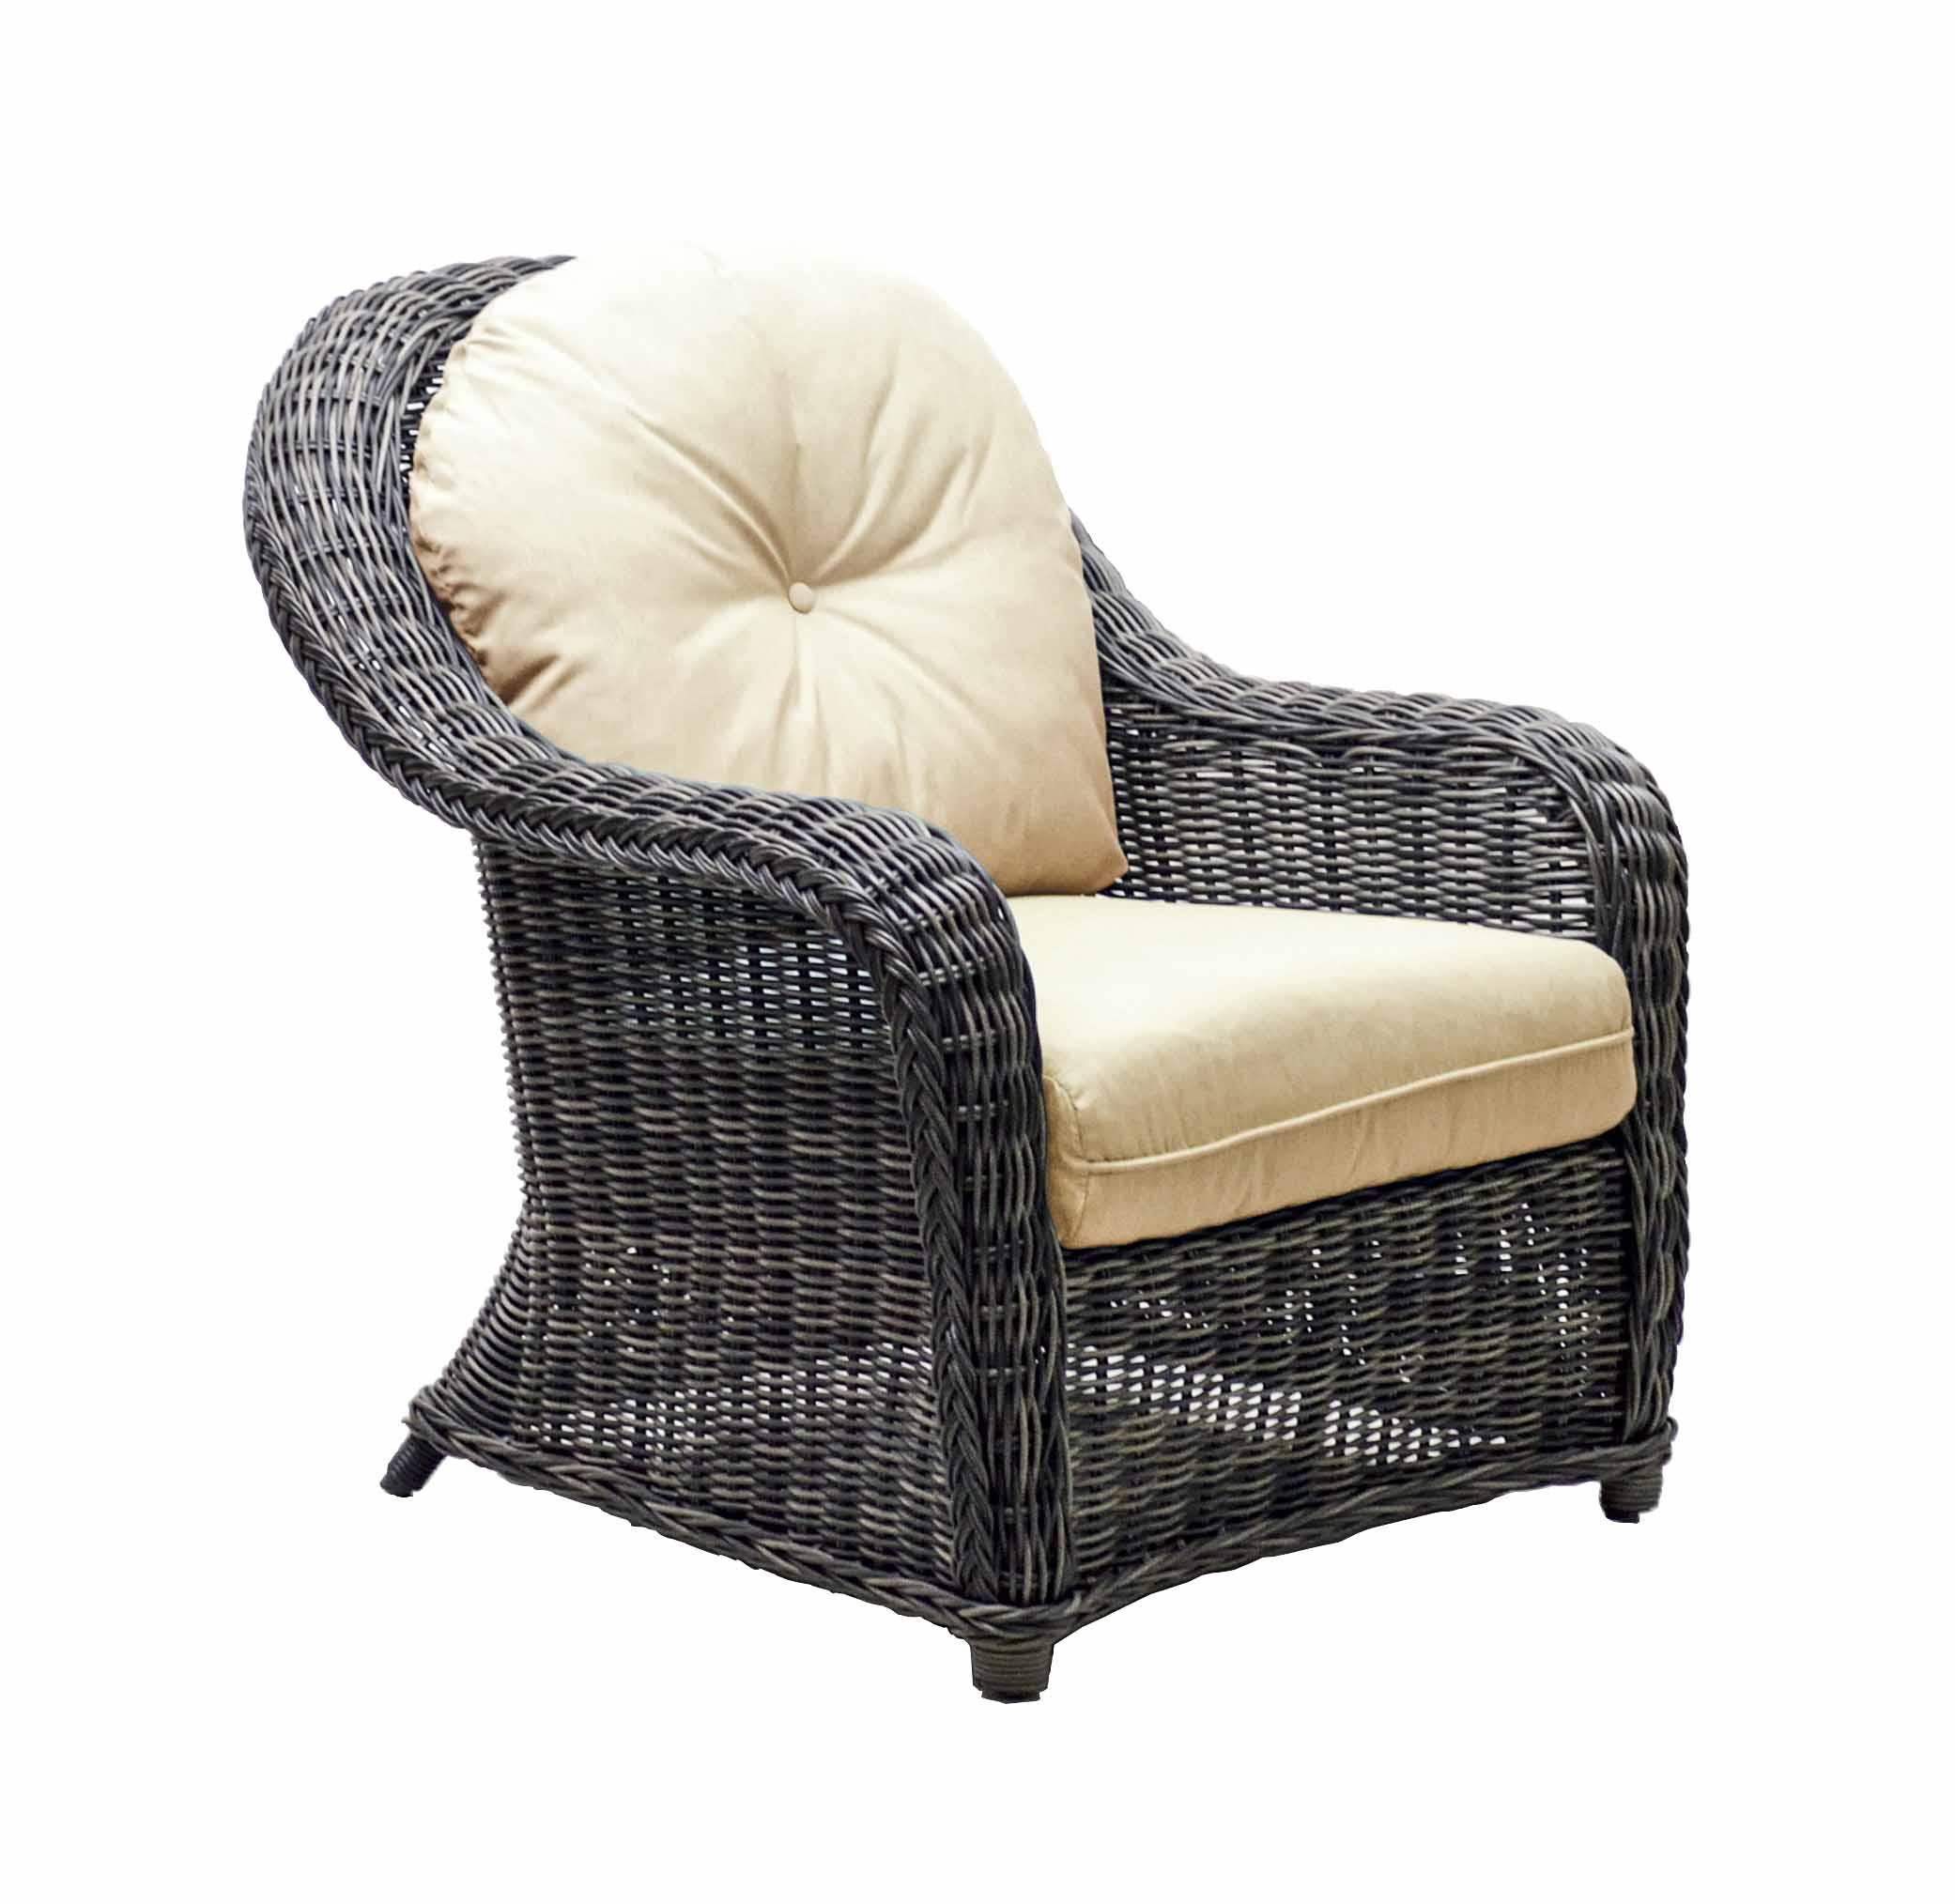 "976731 Everette Lounge Chair   32.1"" x 35.8"" x 36.8"""